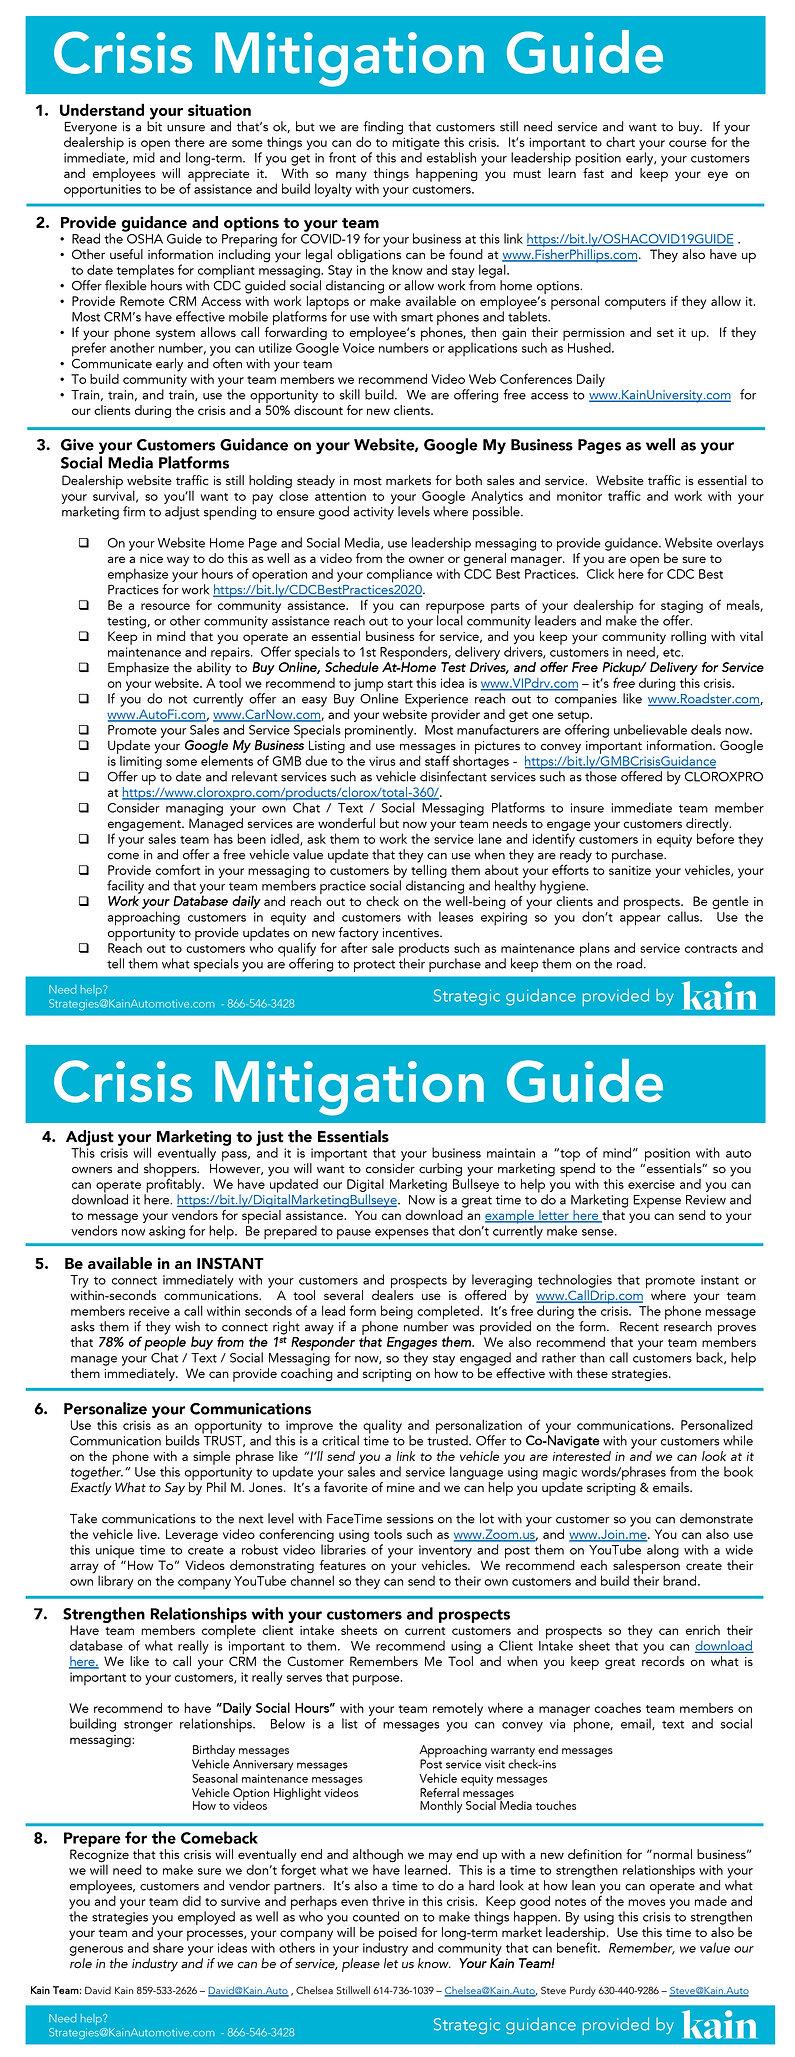 Kain Guide Mar 2020-1.jpg